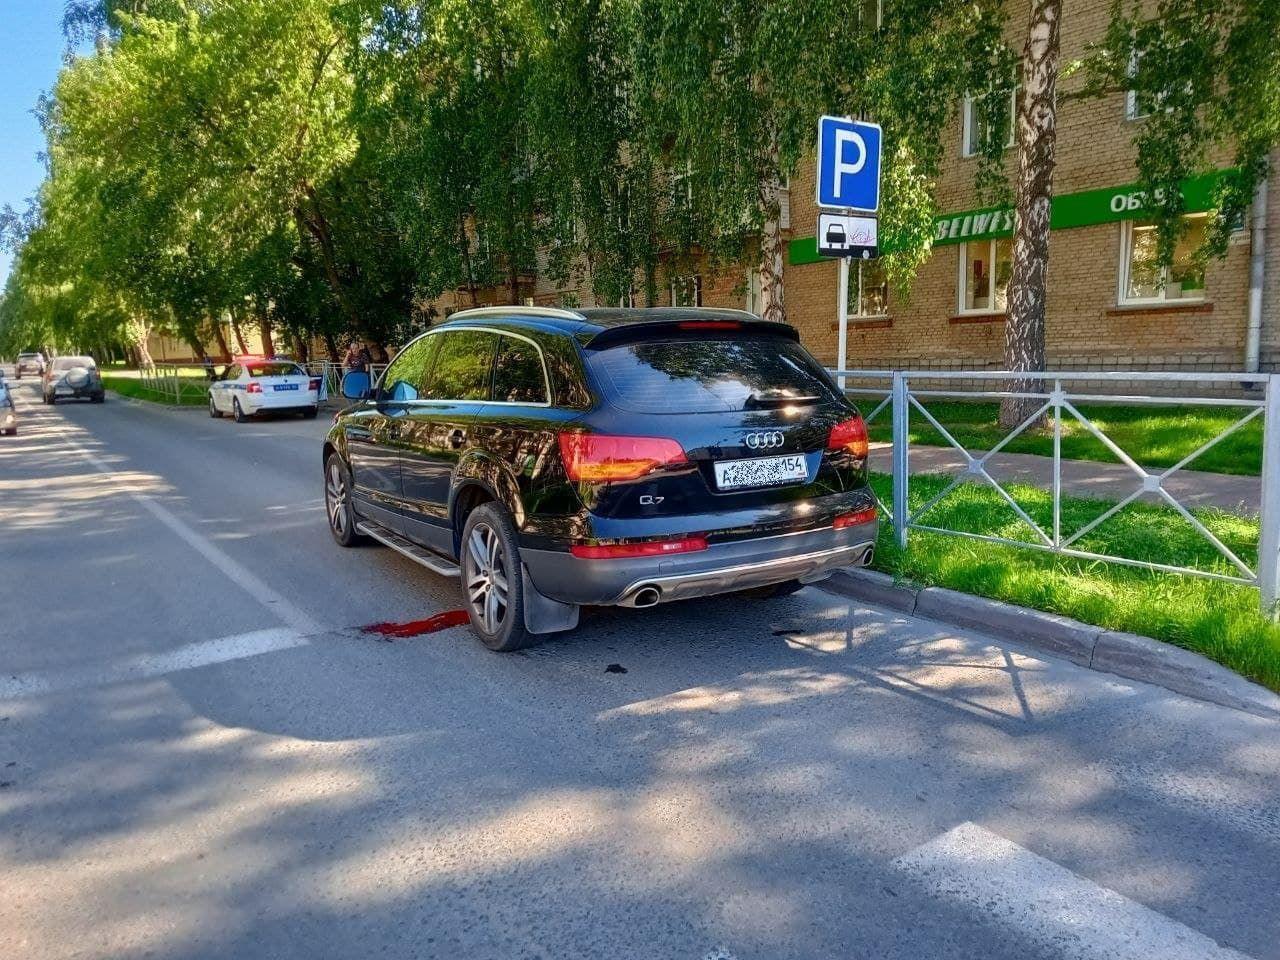 Фото Пятилетний ребёнок погиб под колёсами Audi на глазах матери в Новосибирске 2